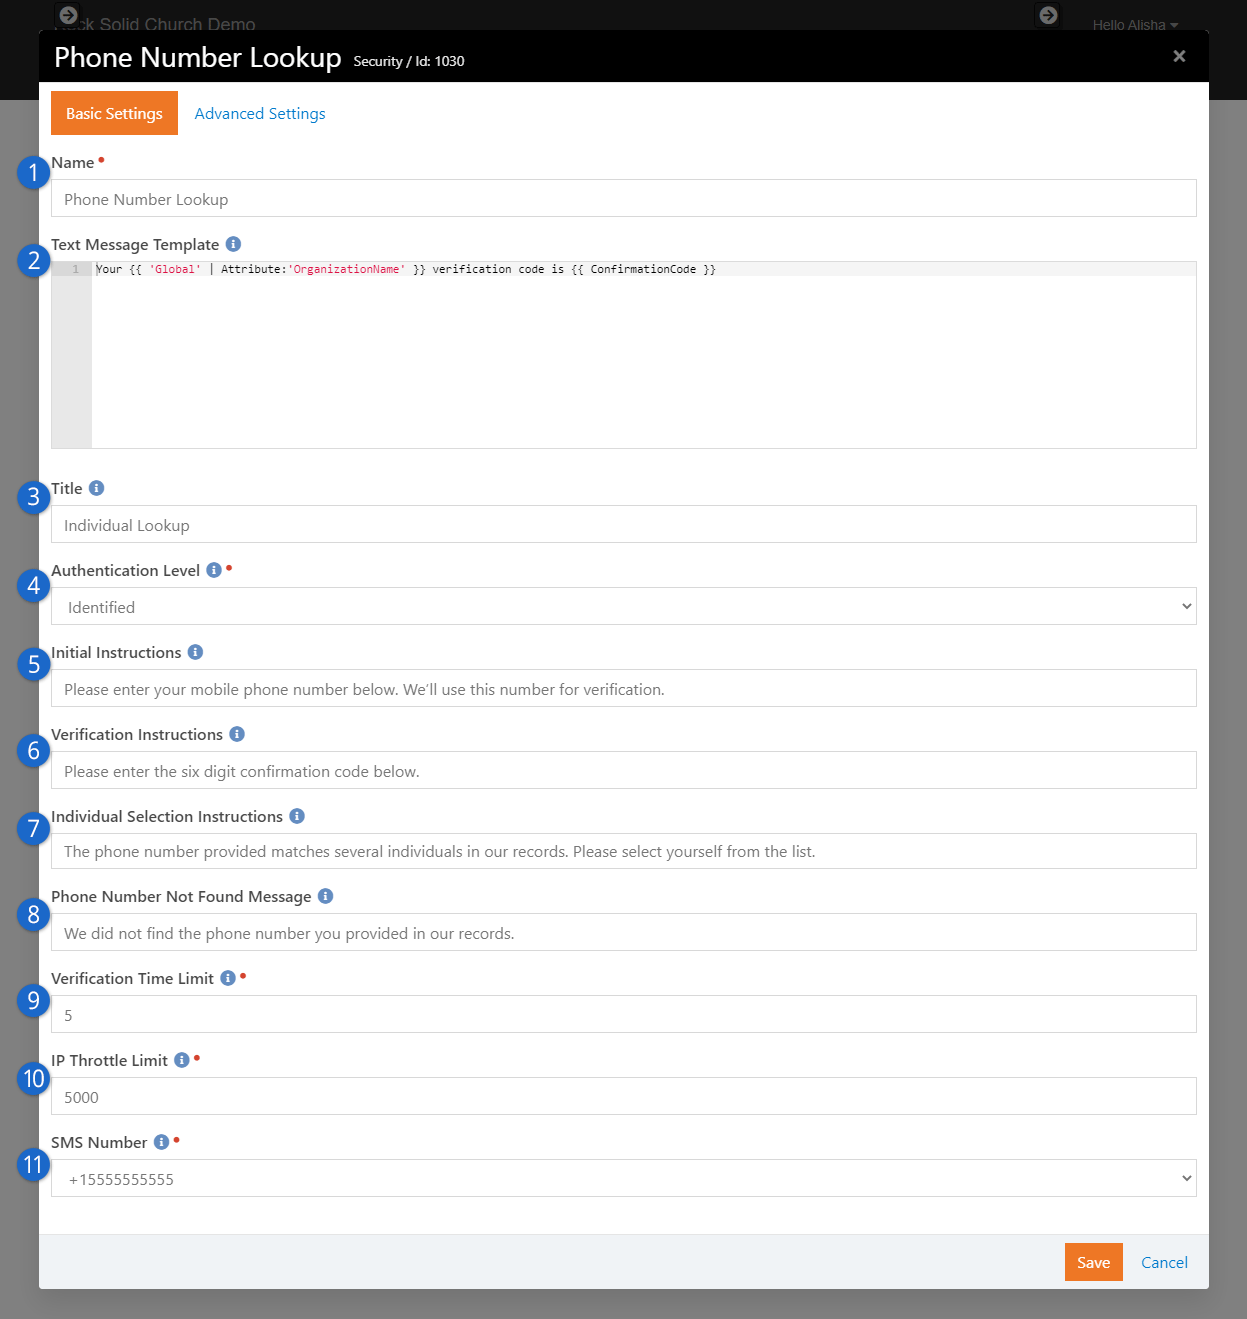 phone-number-lookup-block-settings